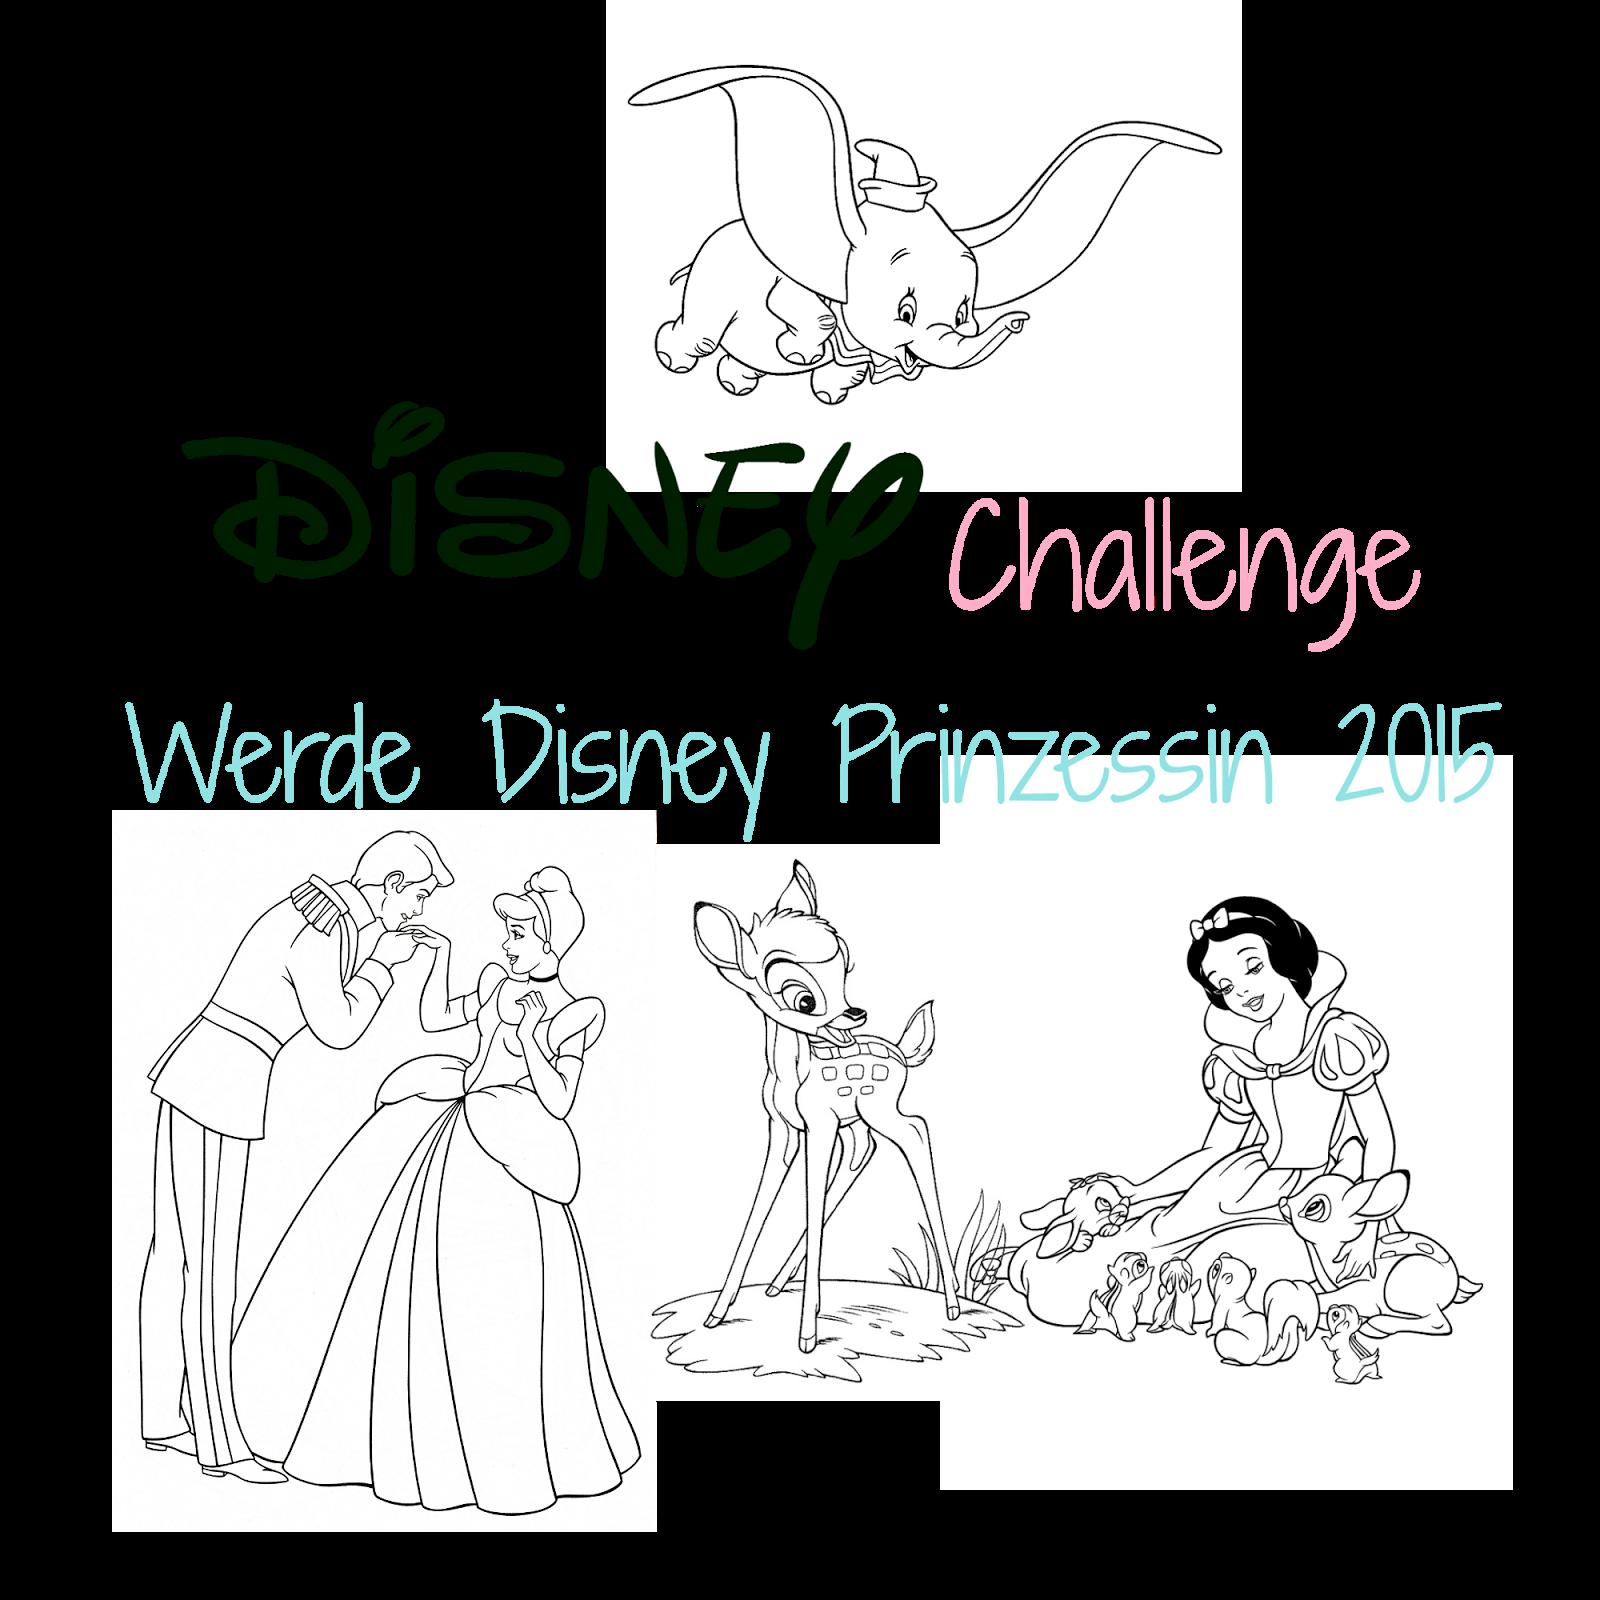 http://bowsandfairytales.blogspot.de/p/disney-challenge-werde-disney.html